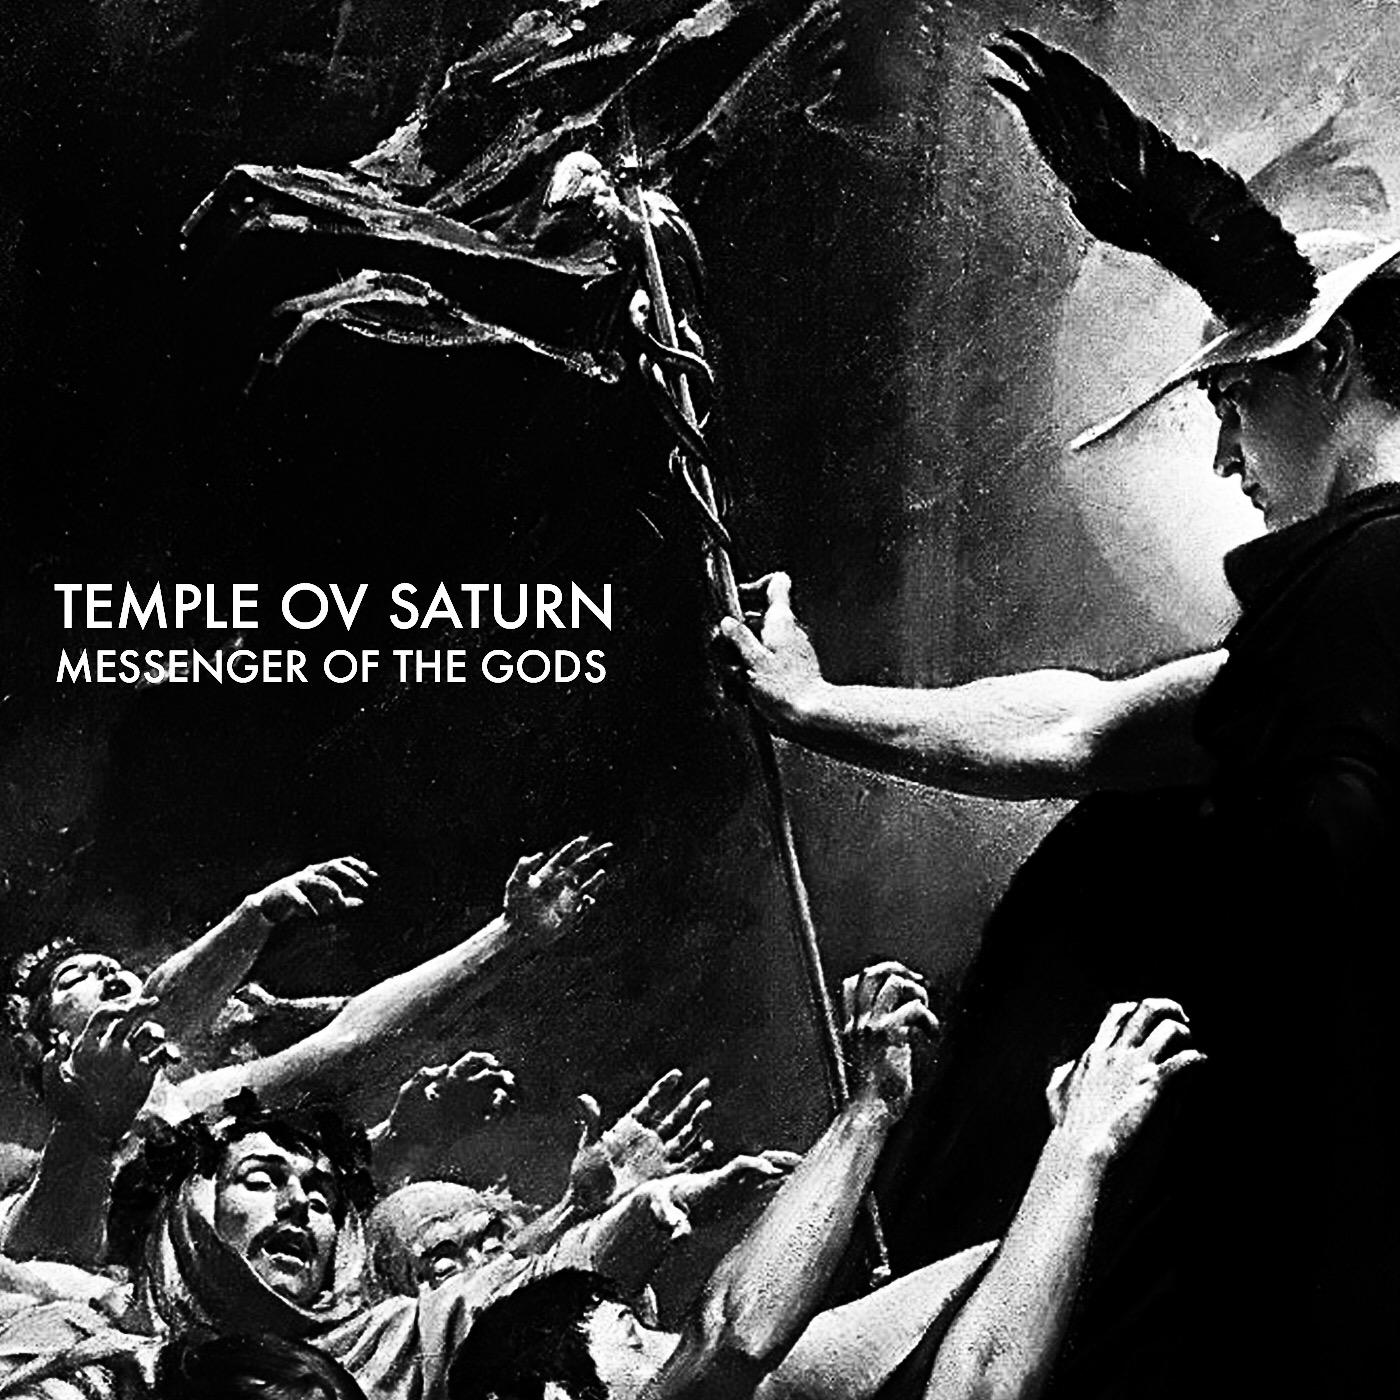 Temple ov Saturn - Messenger of the Gods